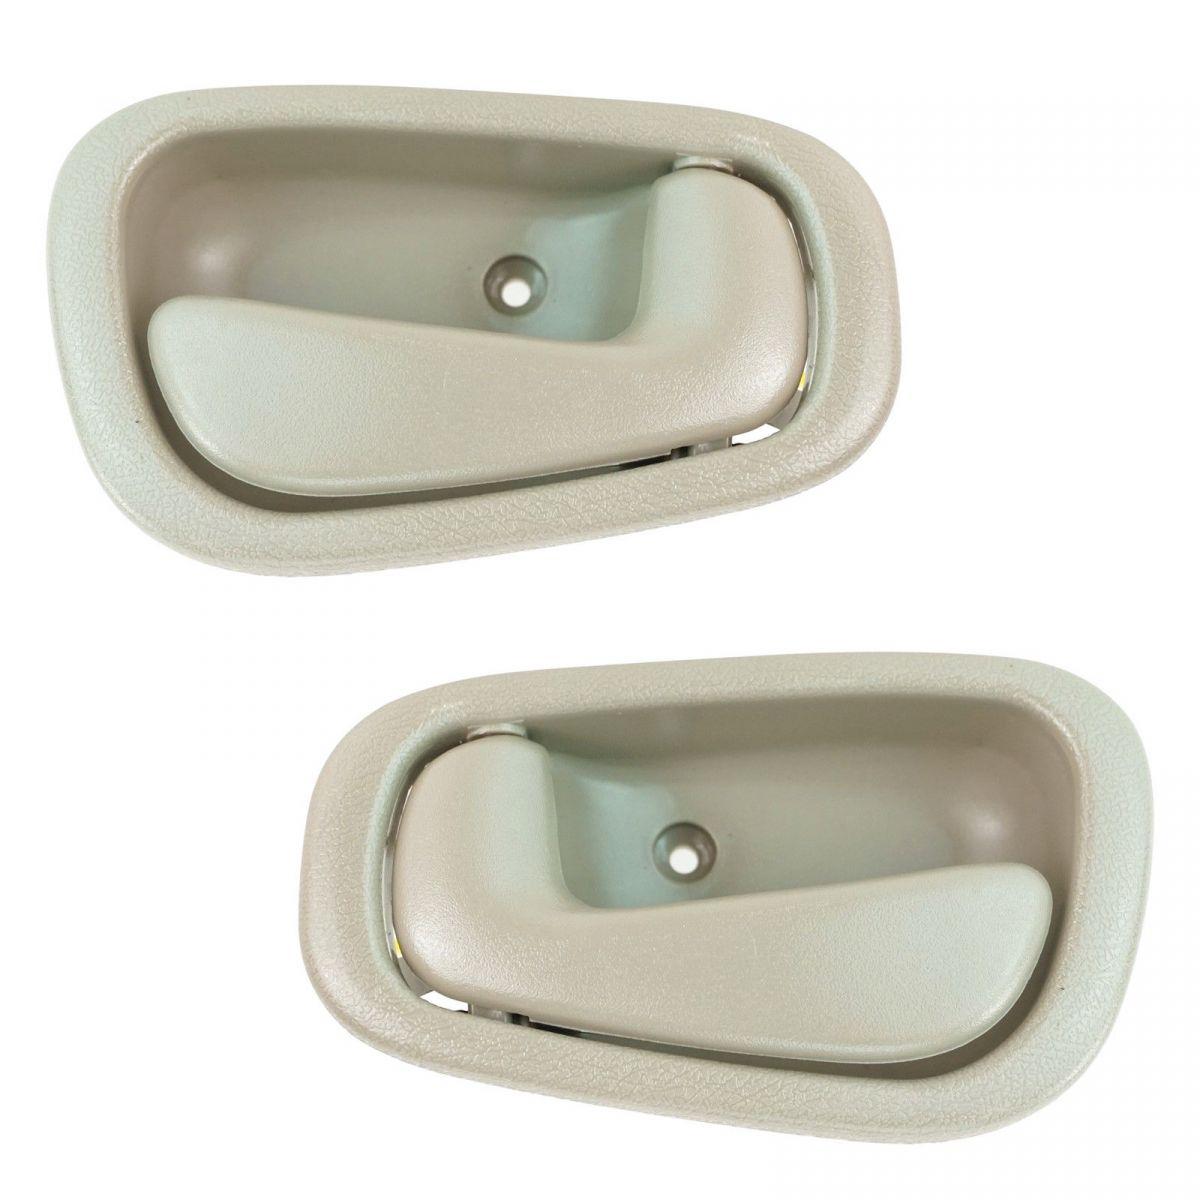 dorman door handles interior tan pair set of 2 for toyota corolla chevy prizm ebay ebay